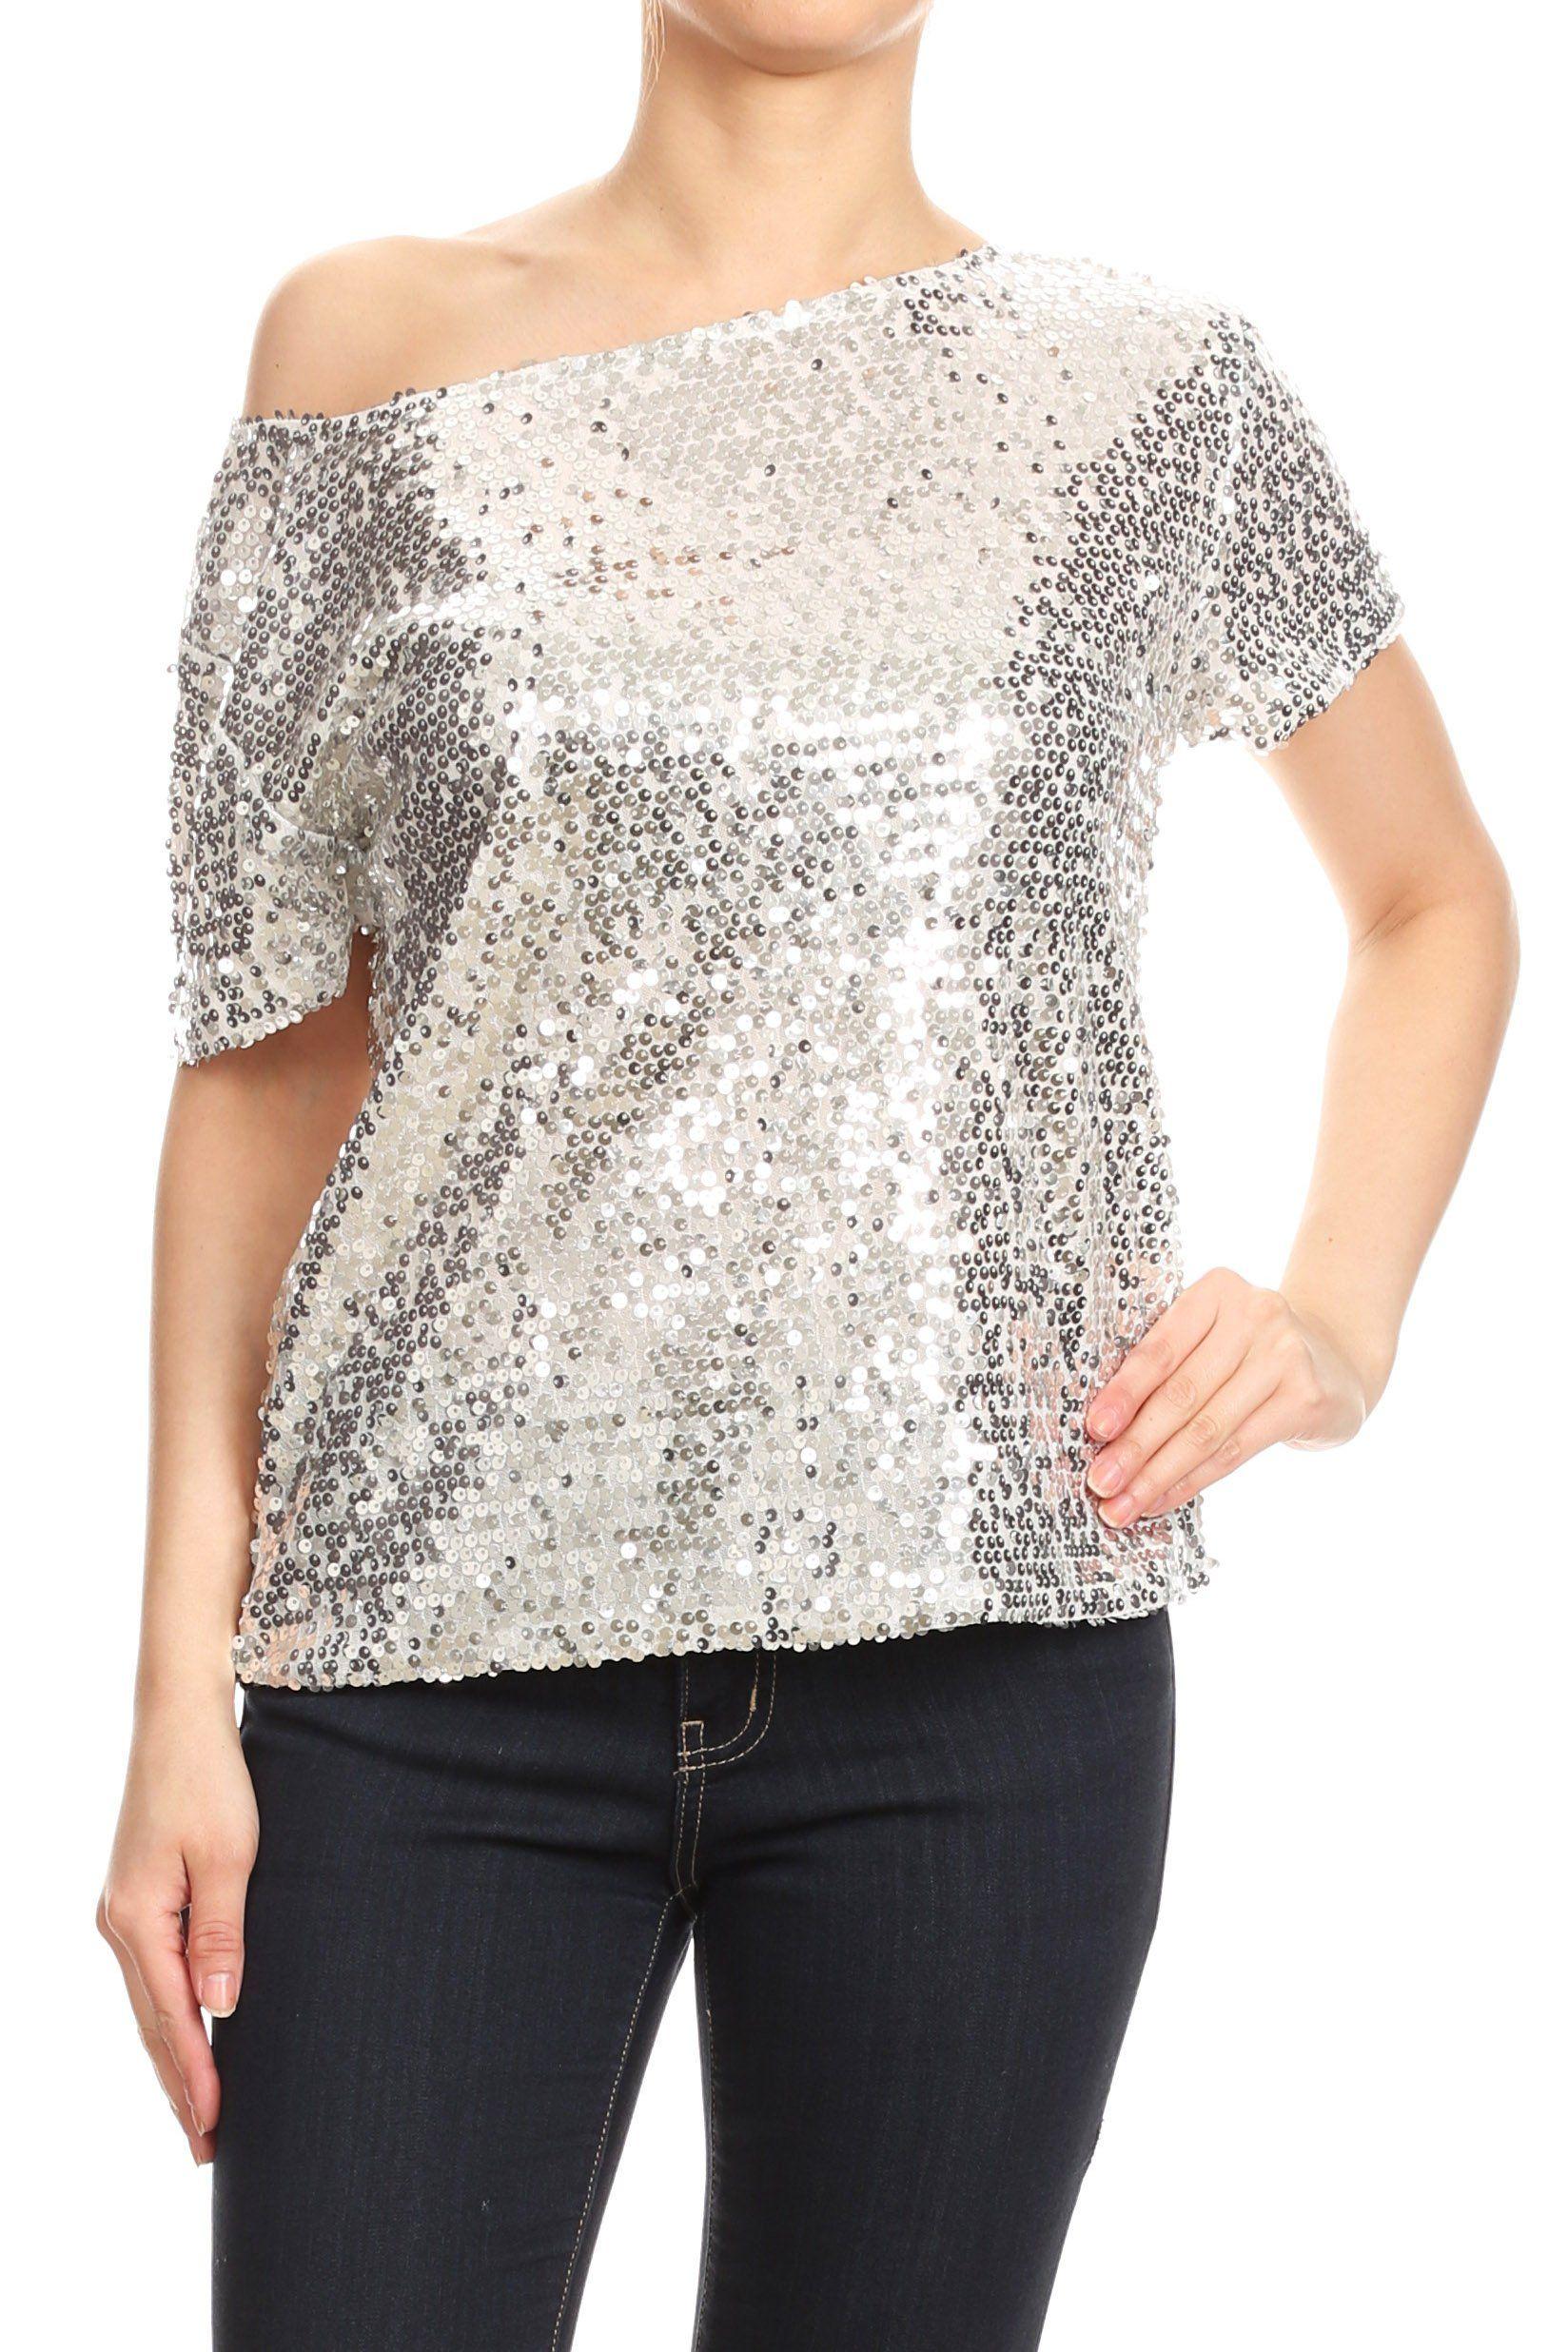 Glam Off-Shoulder Sequin Top - Silver / Medium